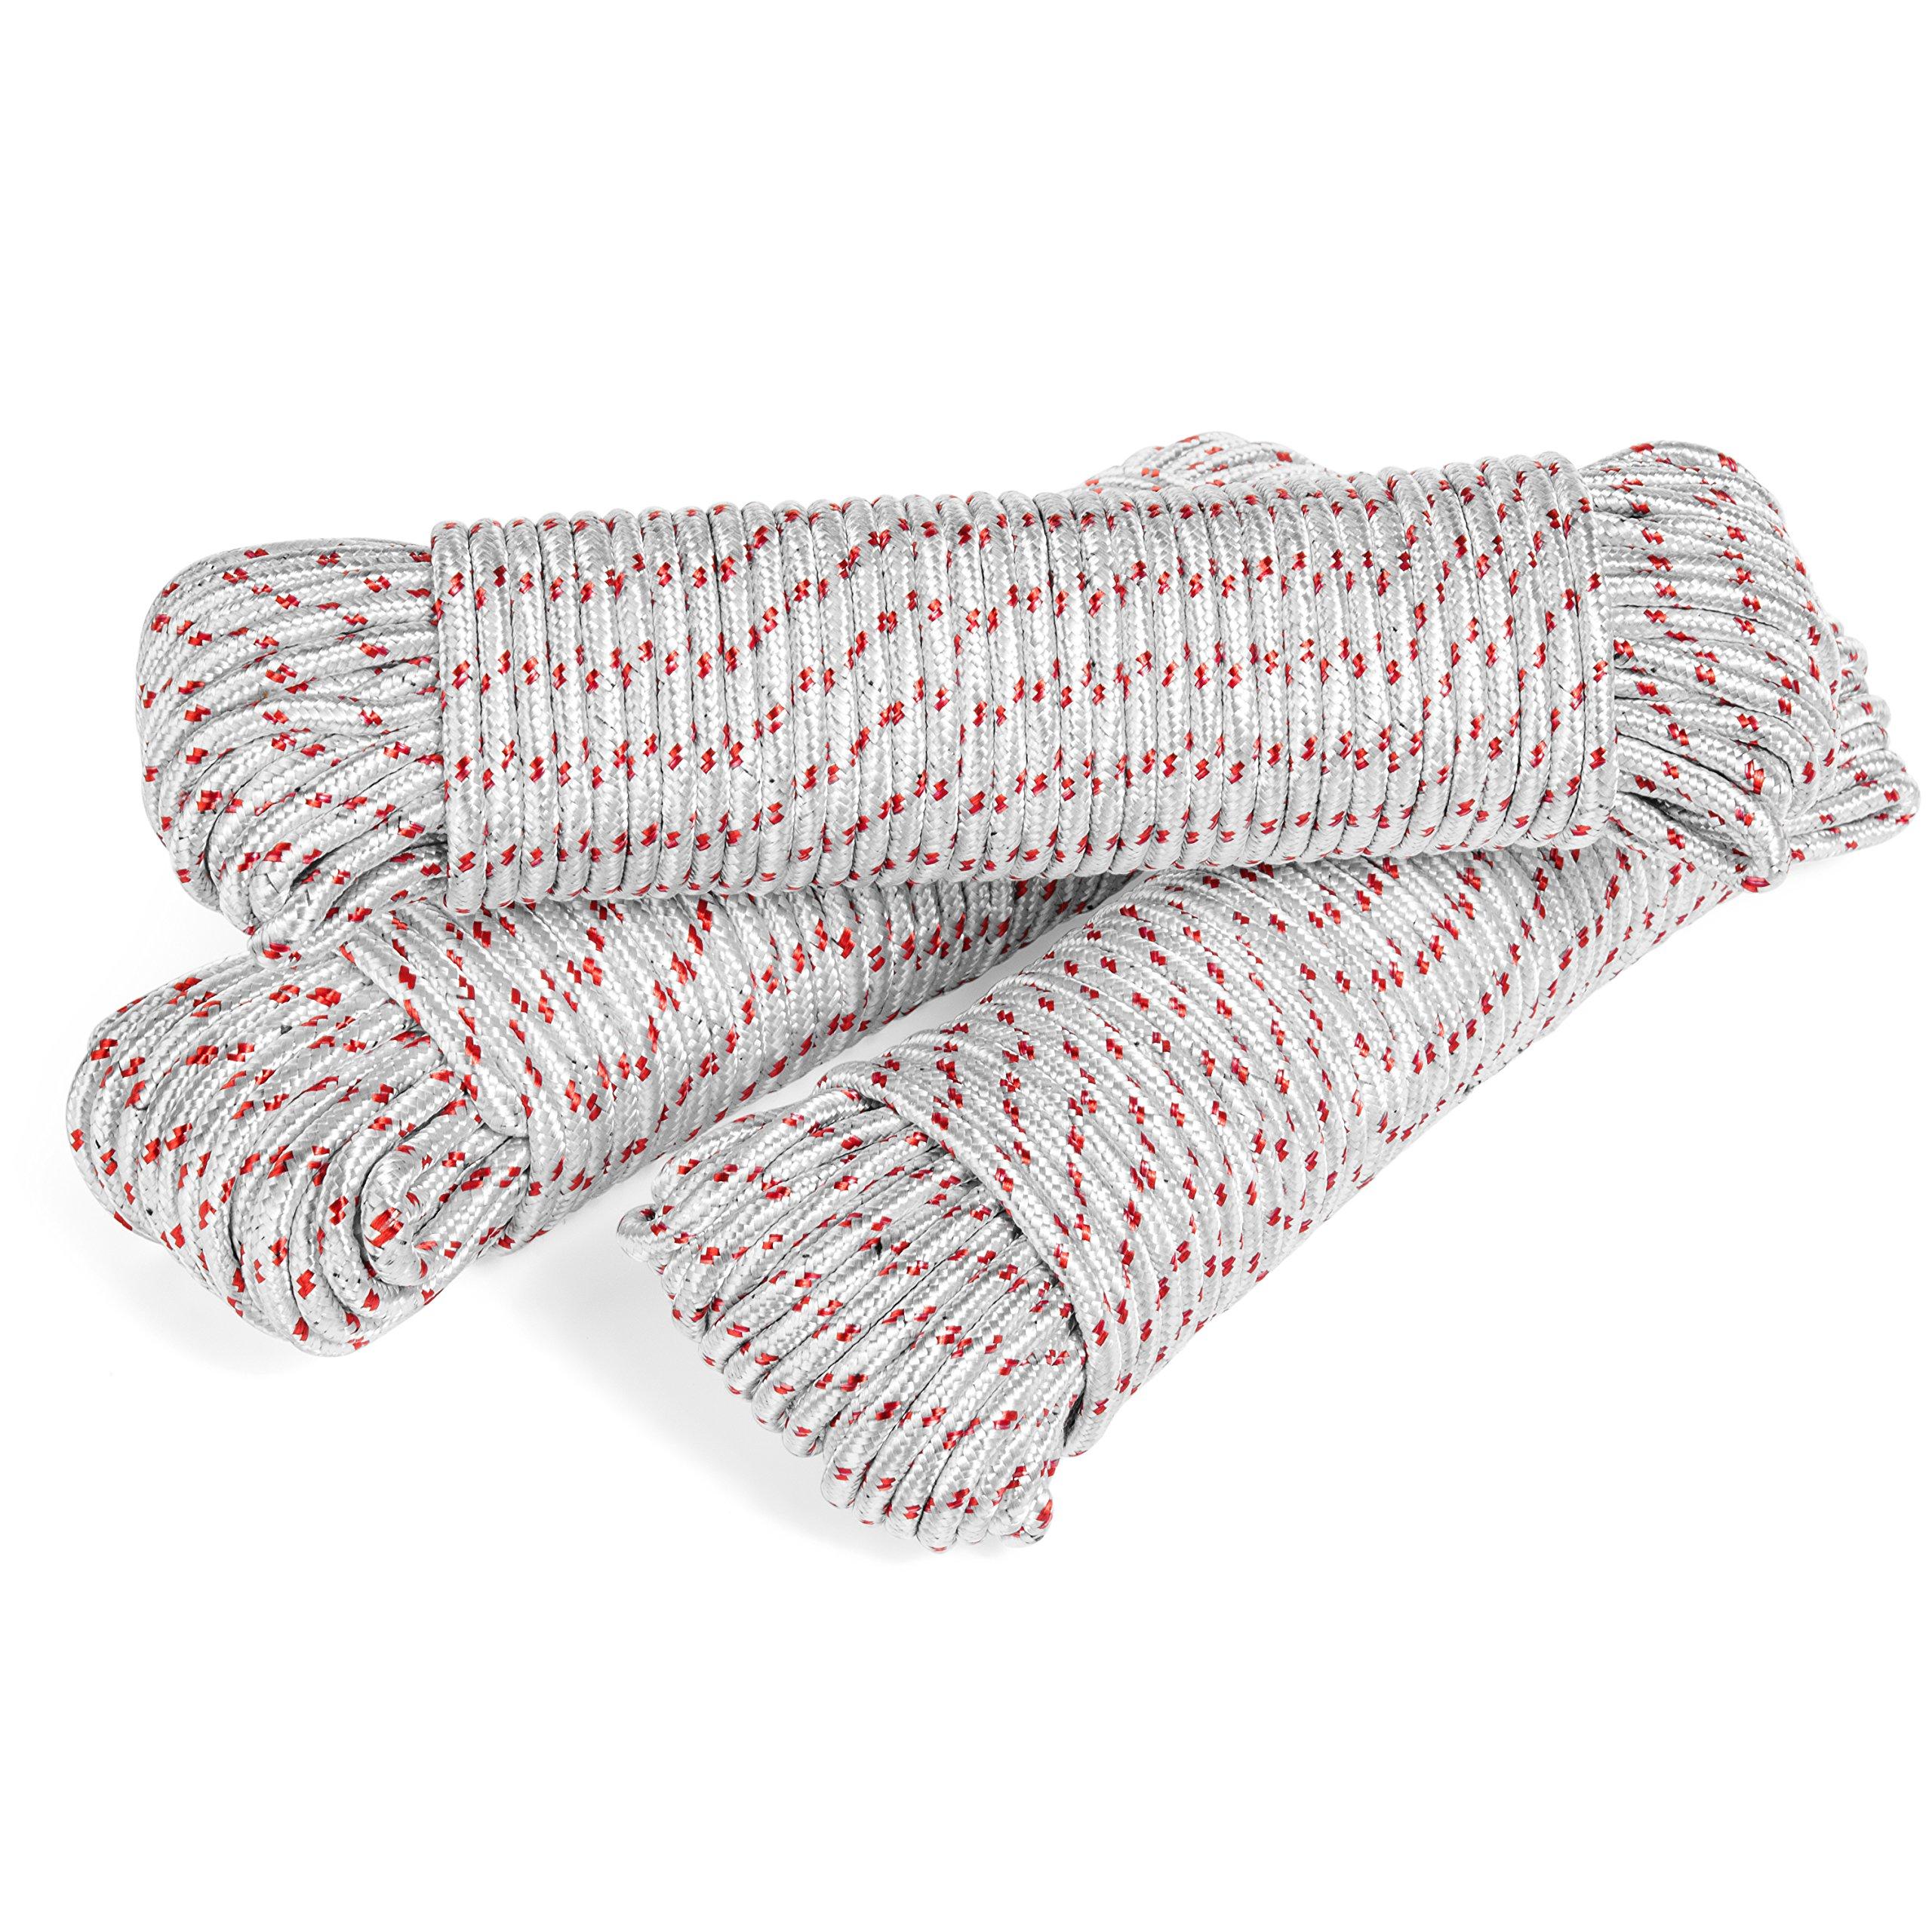 3 pack – Polypropylene Rope – Each Utility Rope 3/16 diameter, 100 ft length - Typhon East